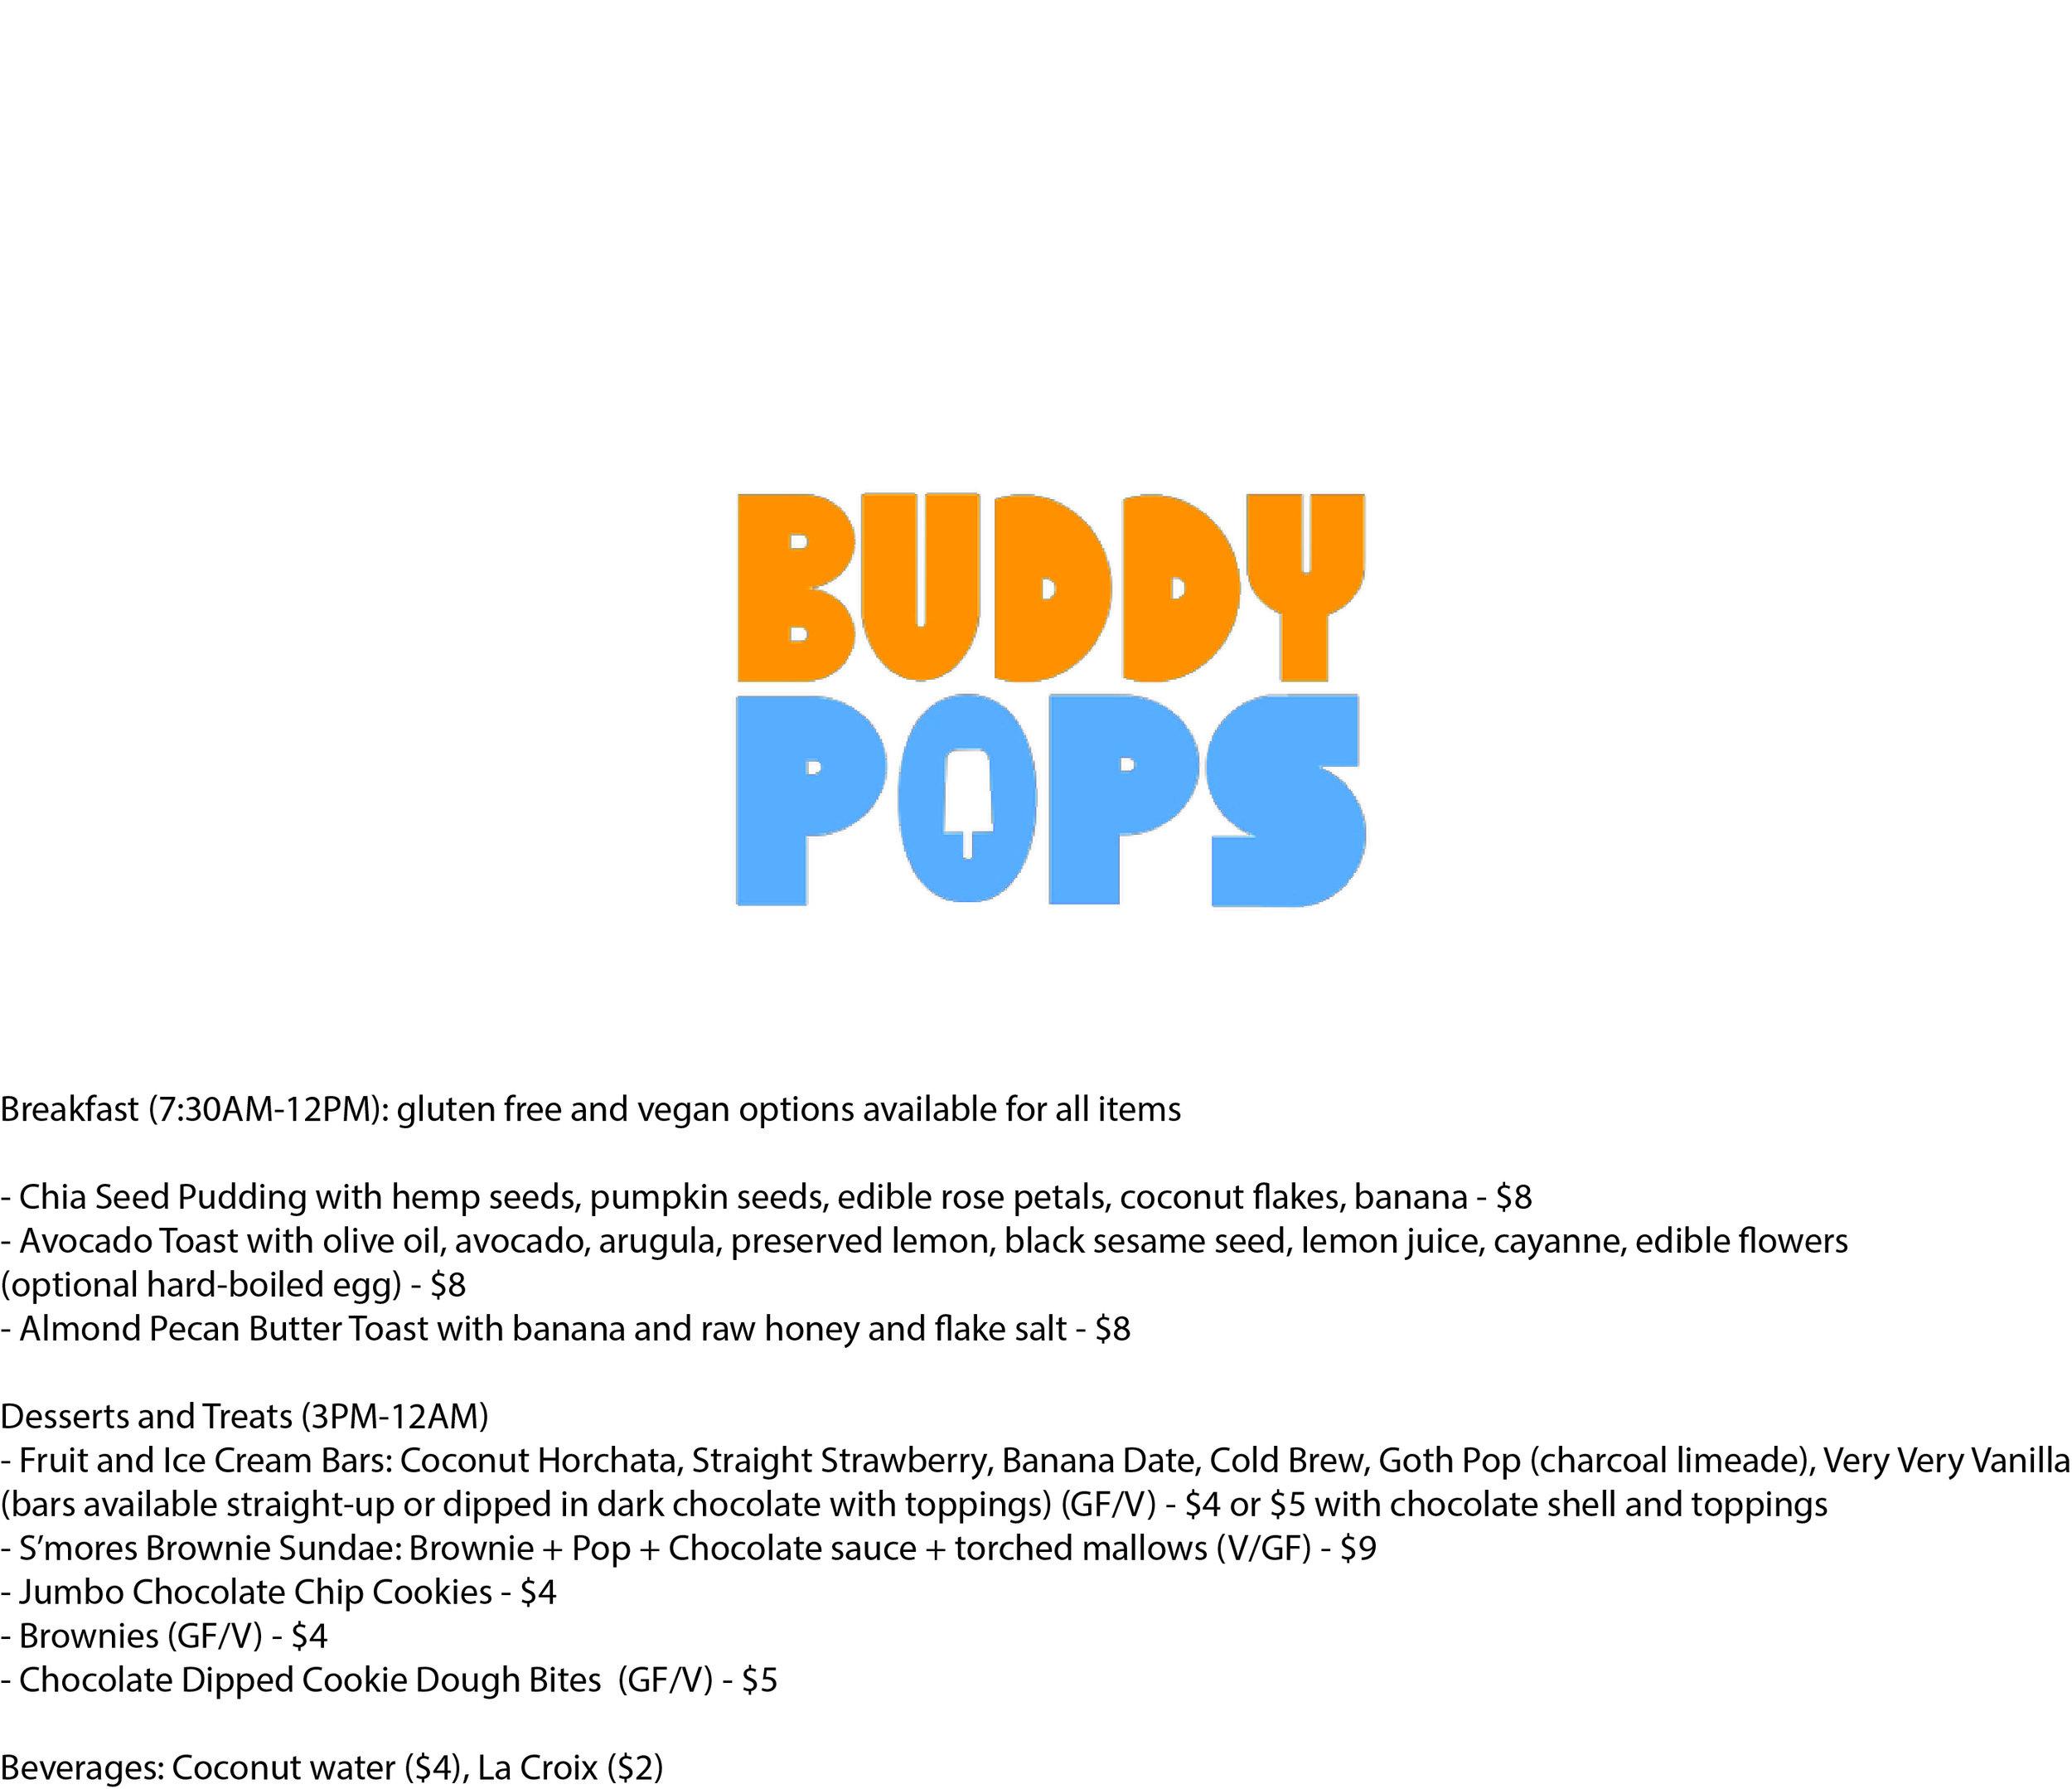 BUDDY POPSX BRO 6.jpg